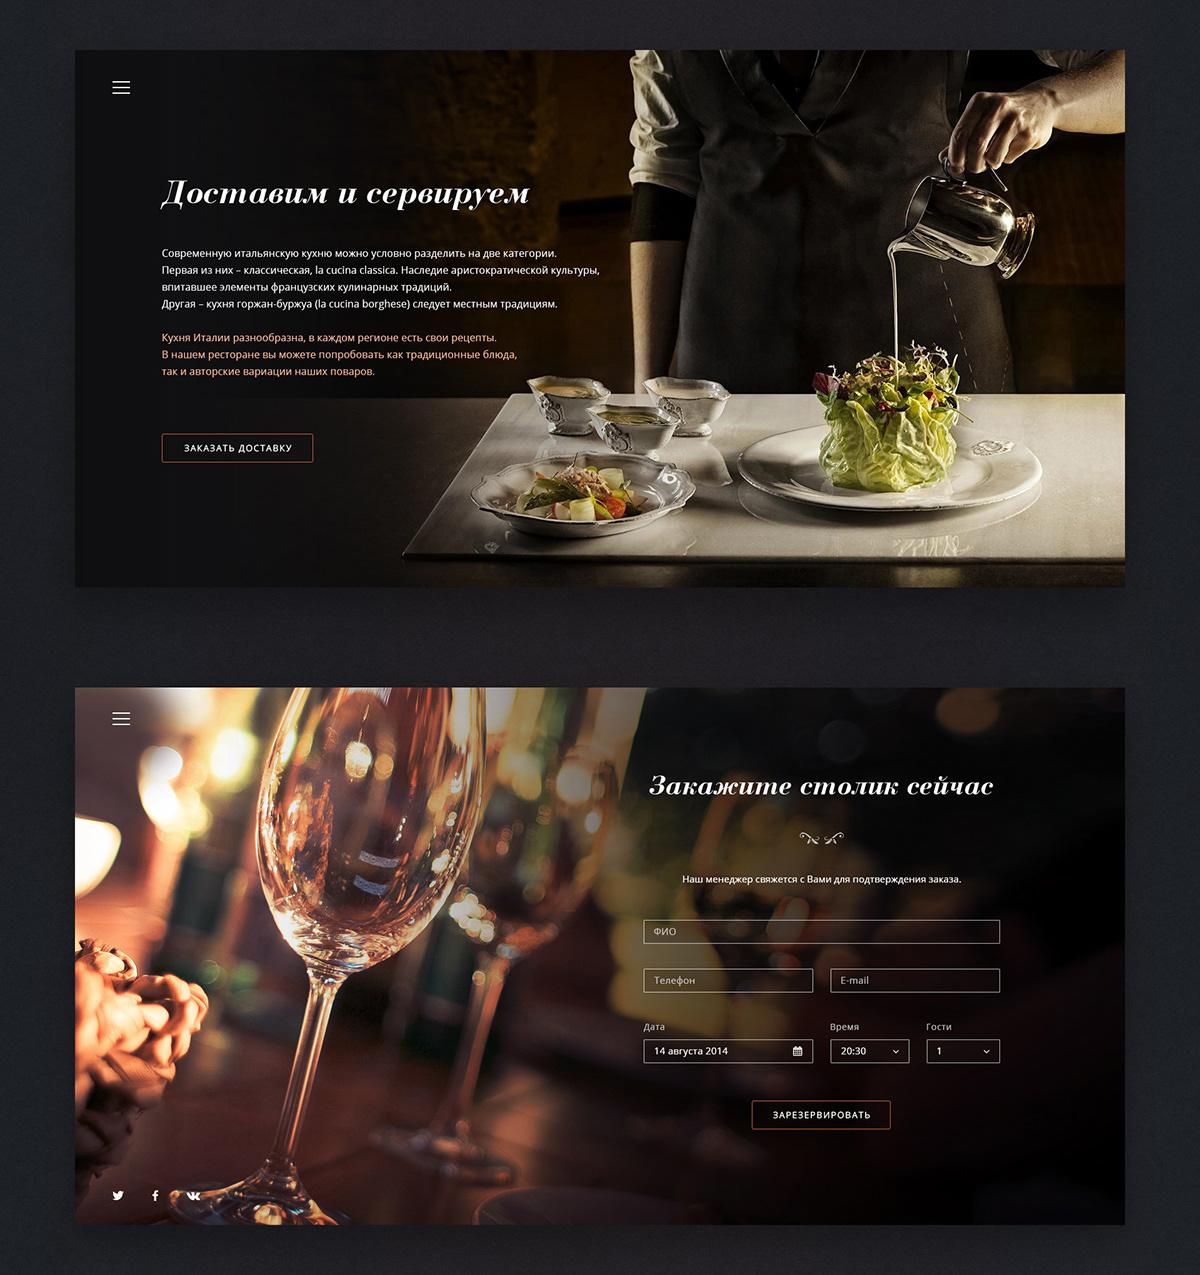 Banchetto Italian Restaurant Website And Logo On Aiga Member Gallery